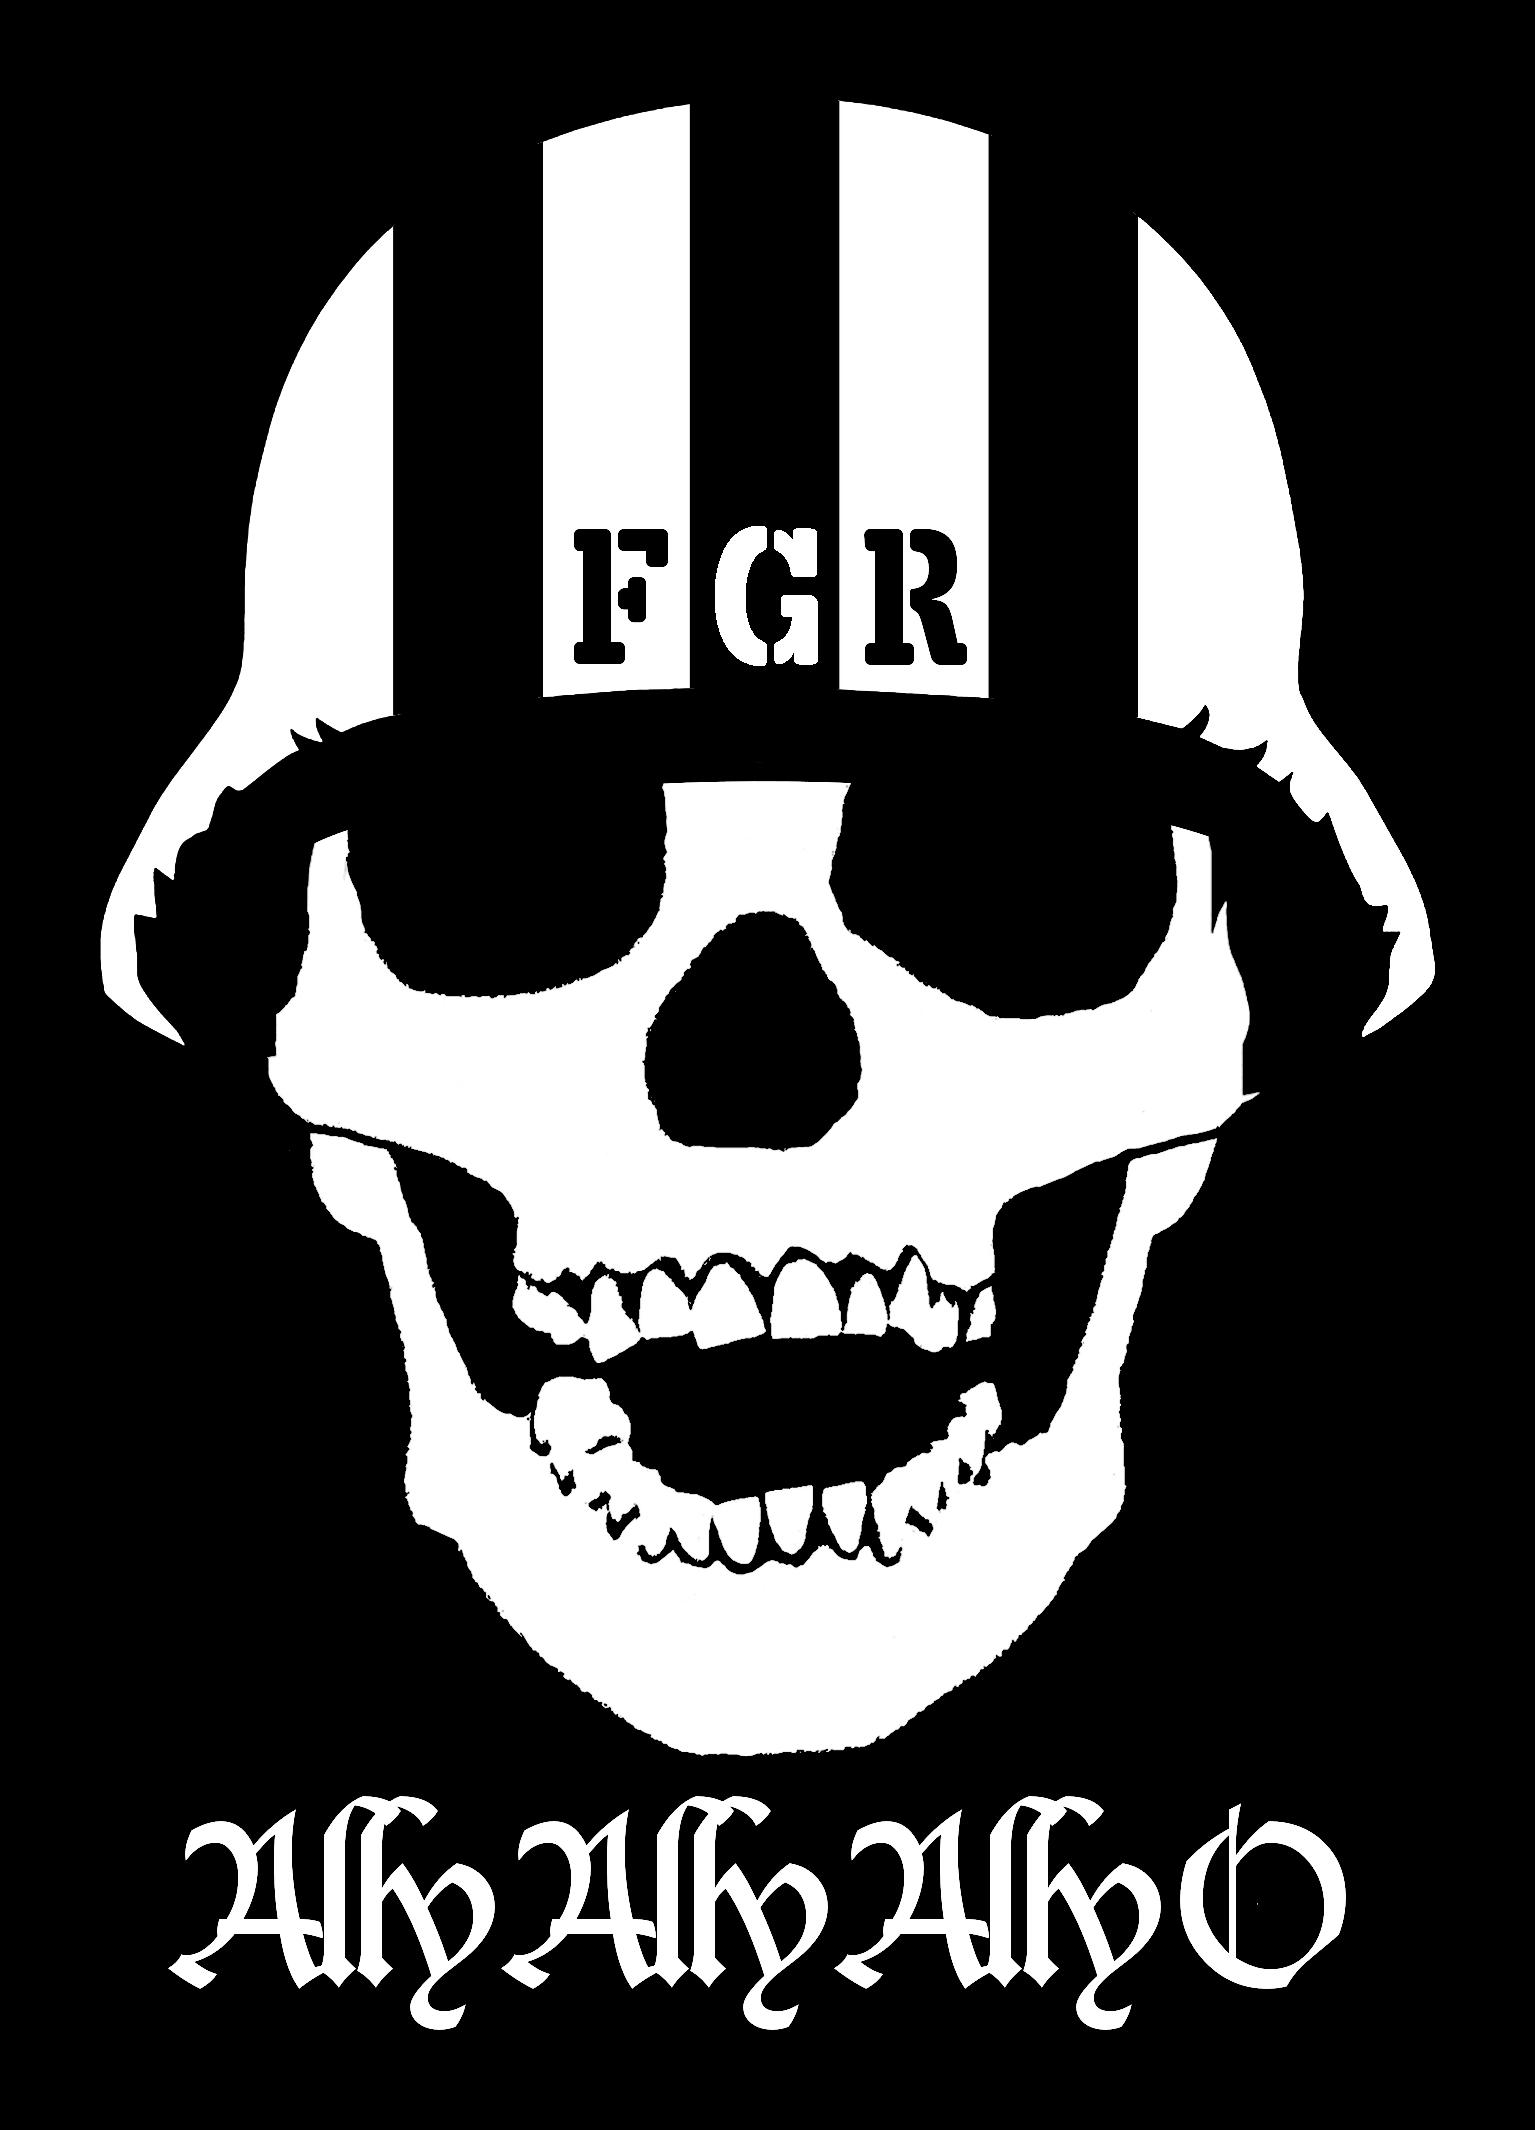 Army logo FGR ally o